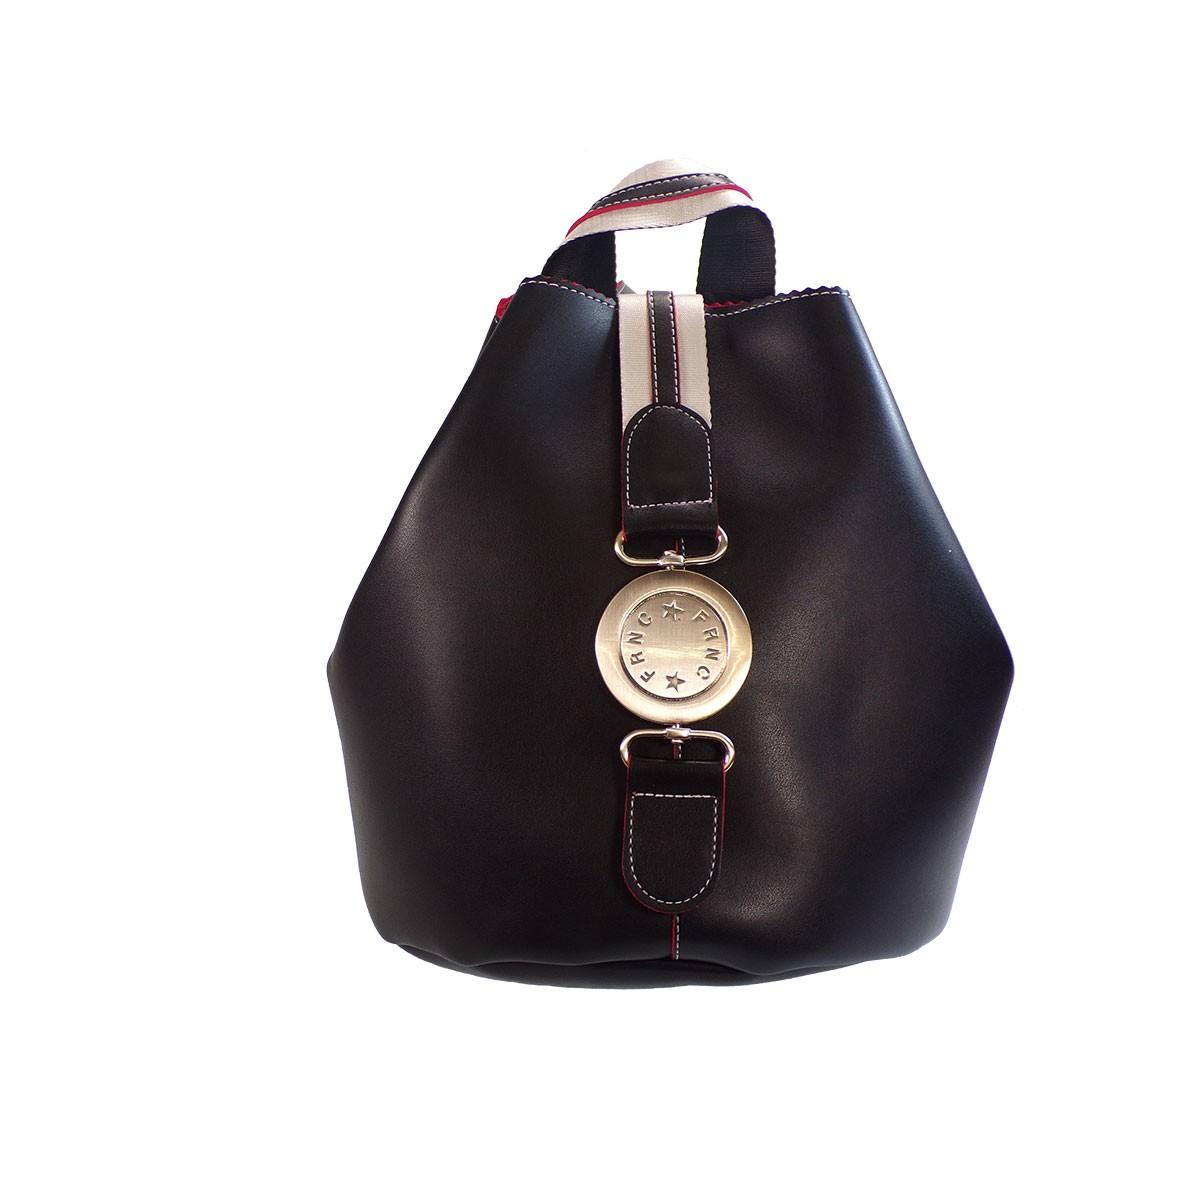 e24babd5c3 FRNC FRANCESCO Τσάντα Γυναικεία Πλάτης-Backpack 562 Μαύρο Δέρμα ...